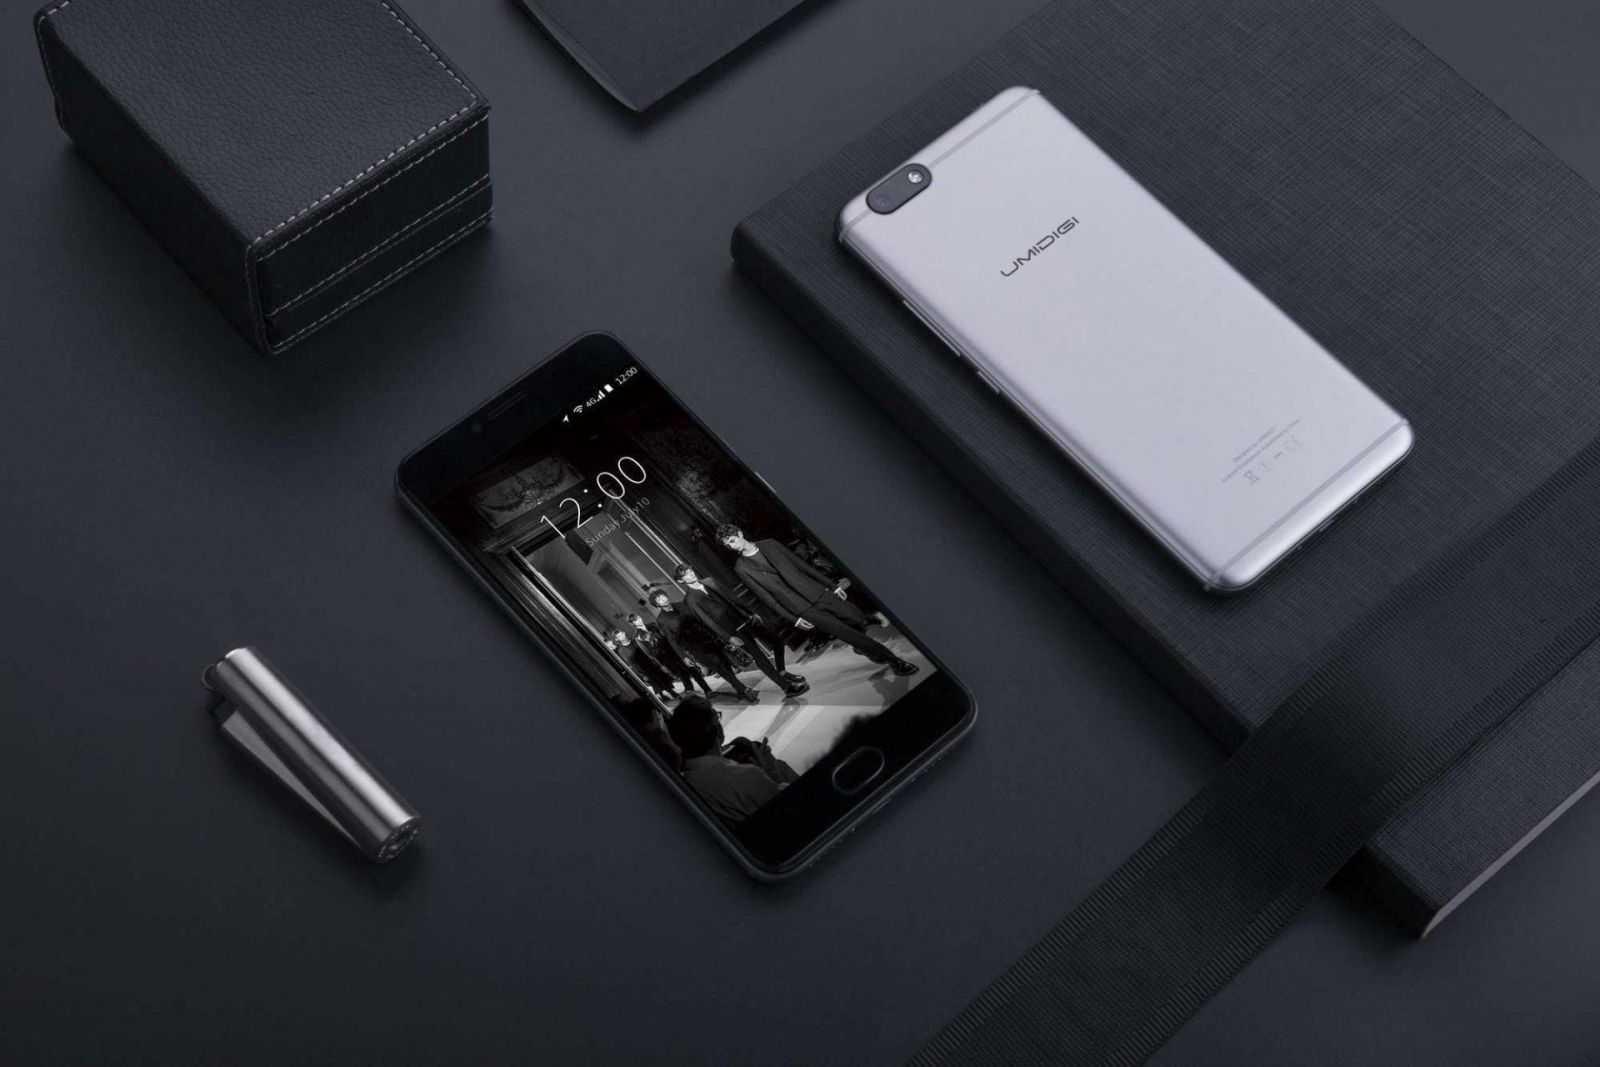 UMIDIGI S NOTE PROMO 01 - UMIDIGI представила доступный флагманский смартфон С NOTE